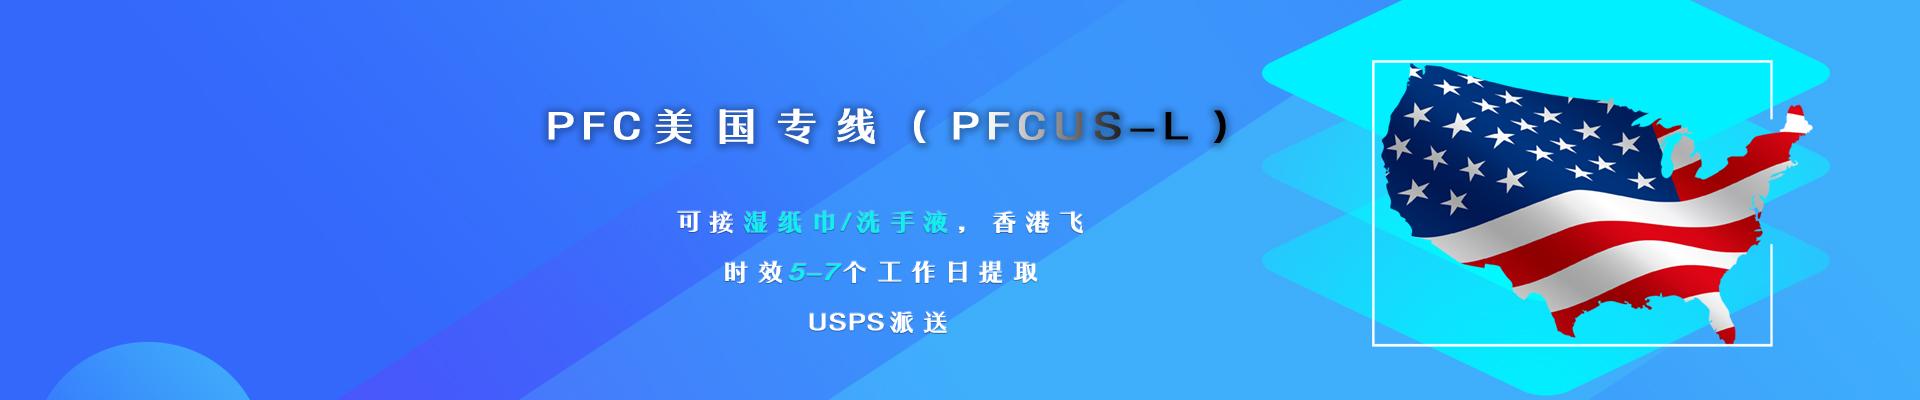 PFC美國DHL小包